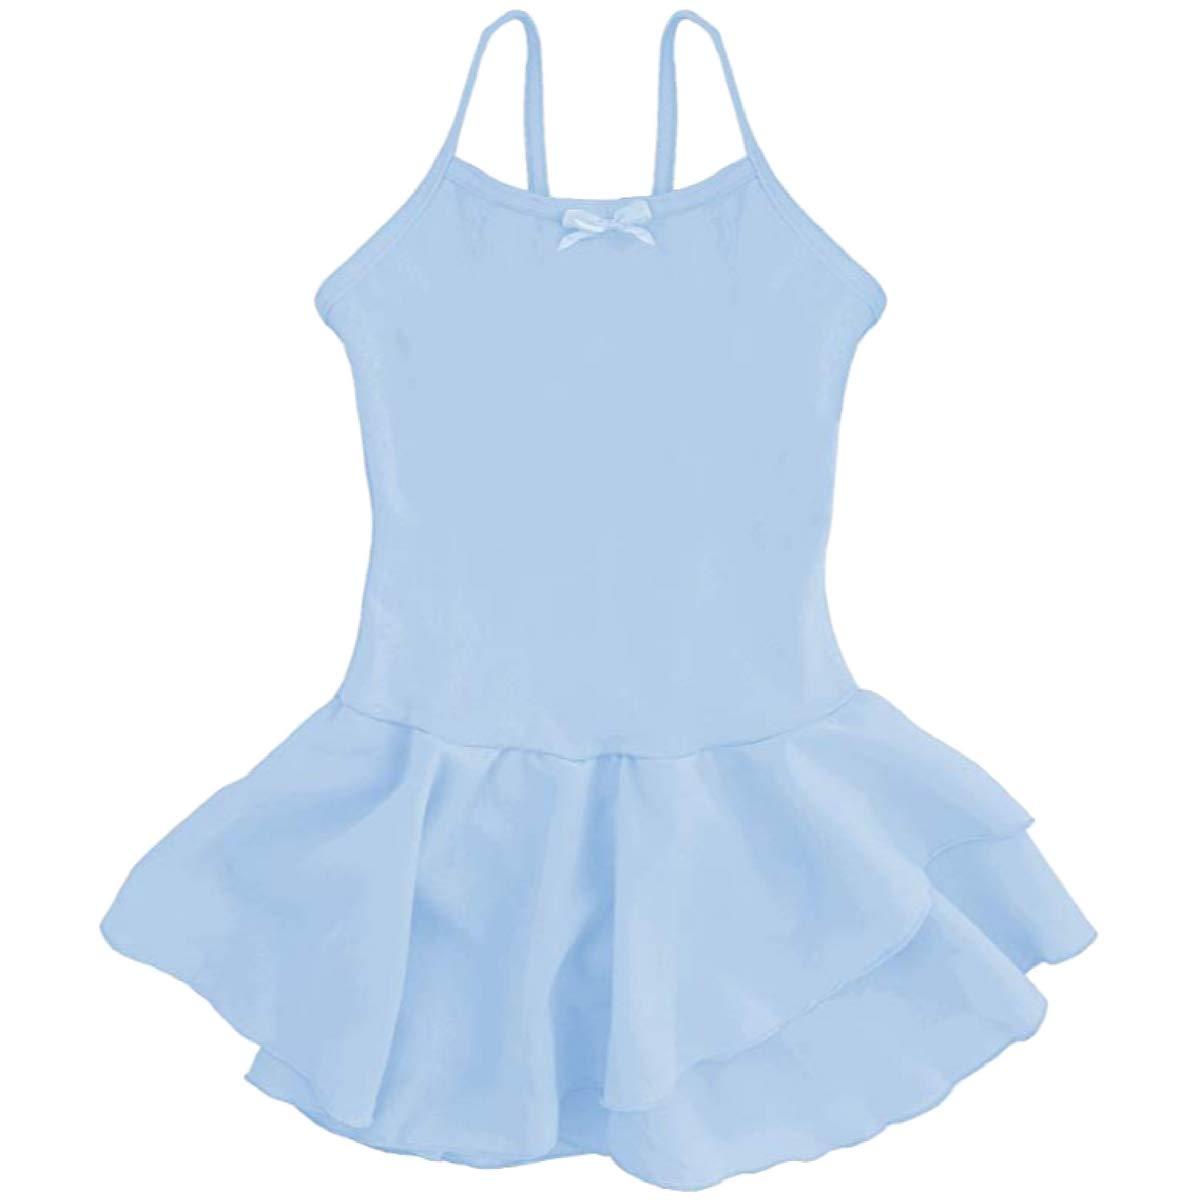 Dancina SHIRT ガールズ B07D4G6CV8 5|ライトブルー ライトブルー 5